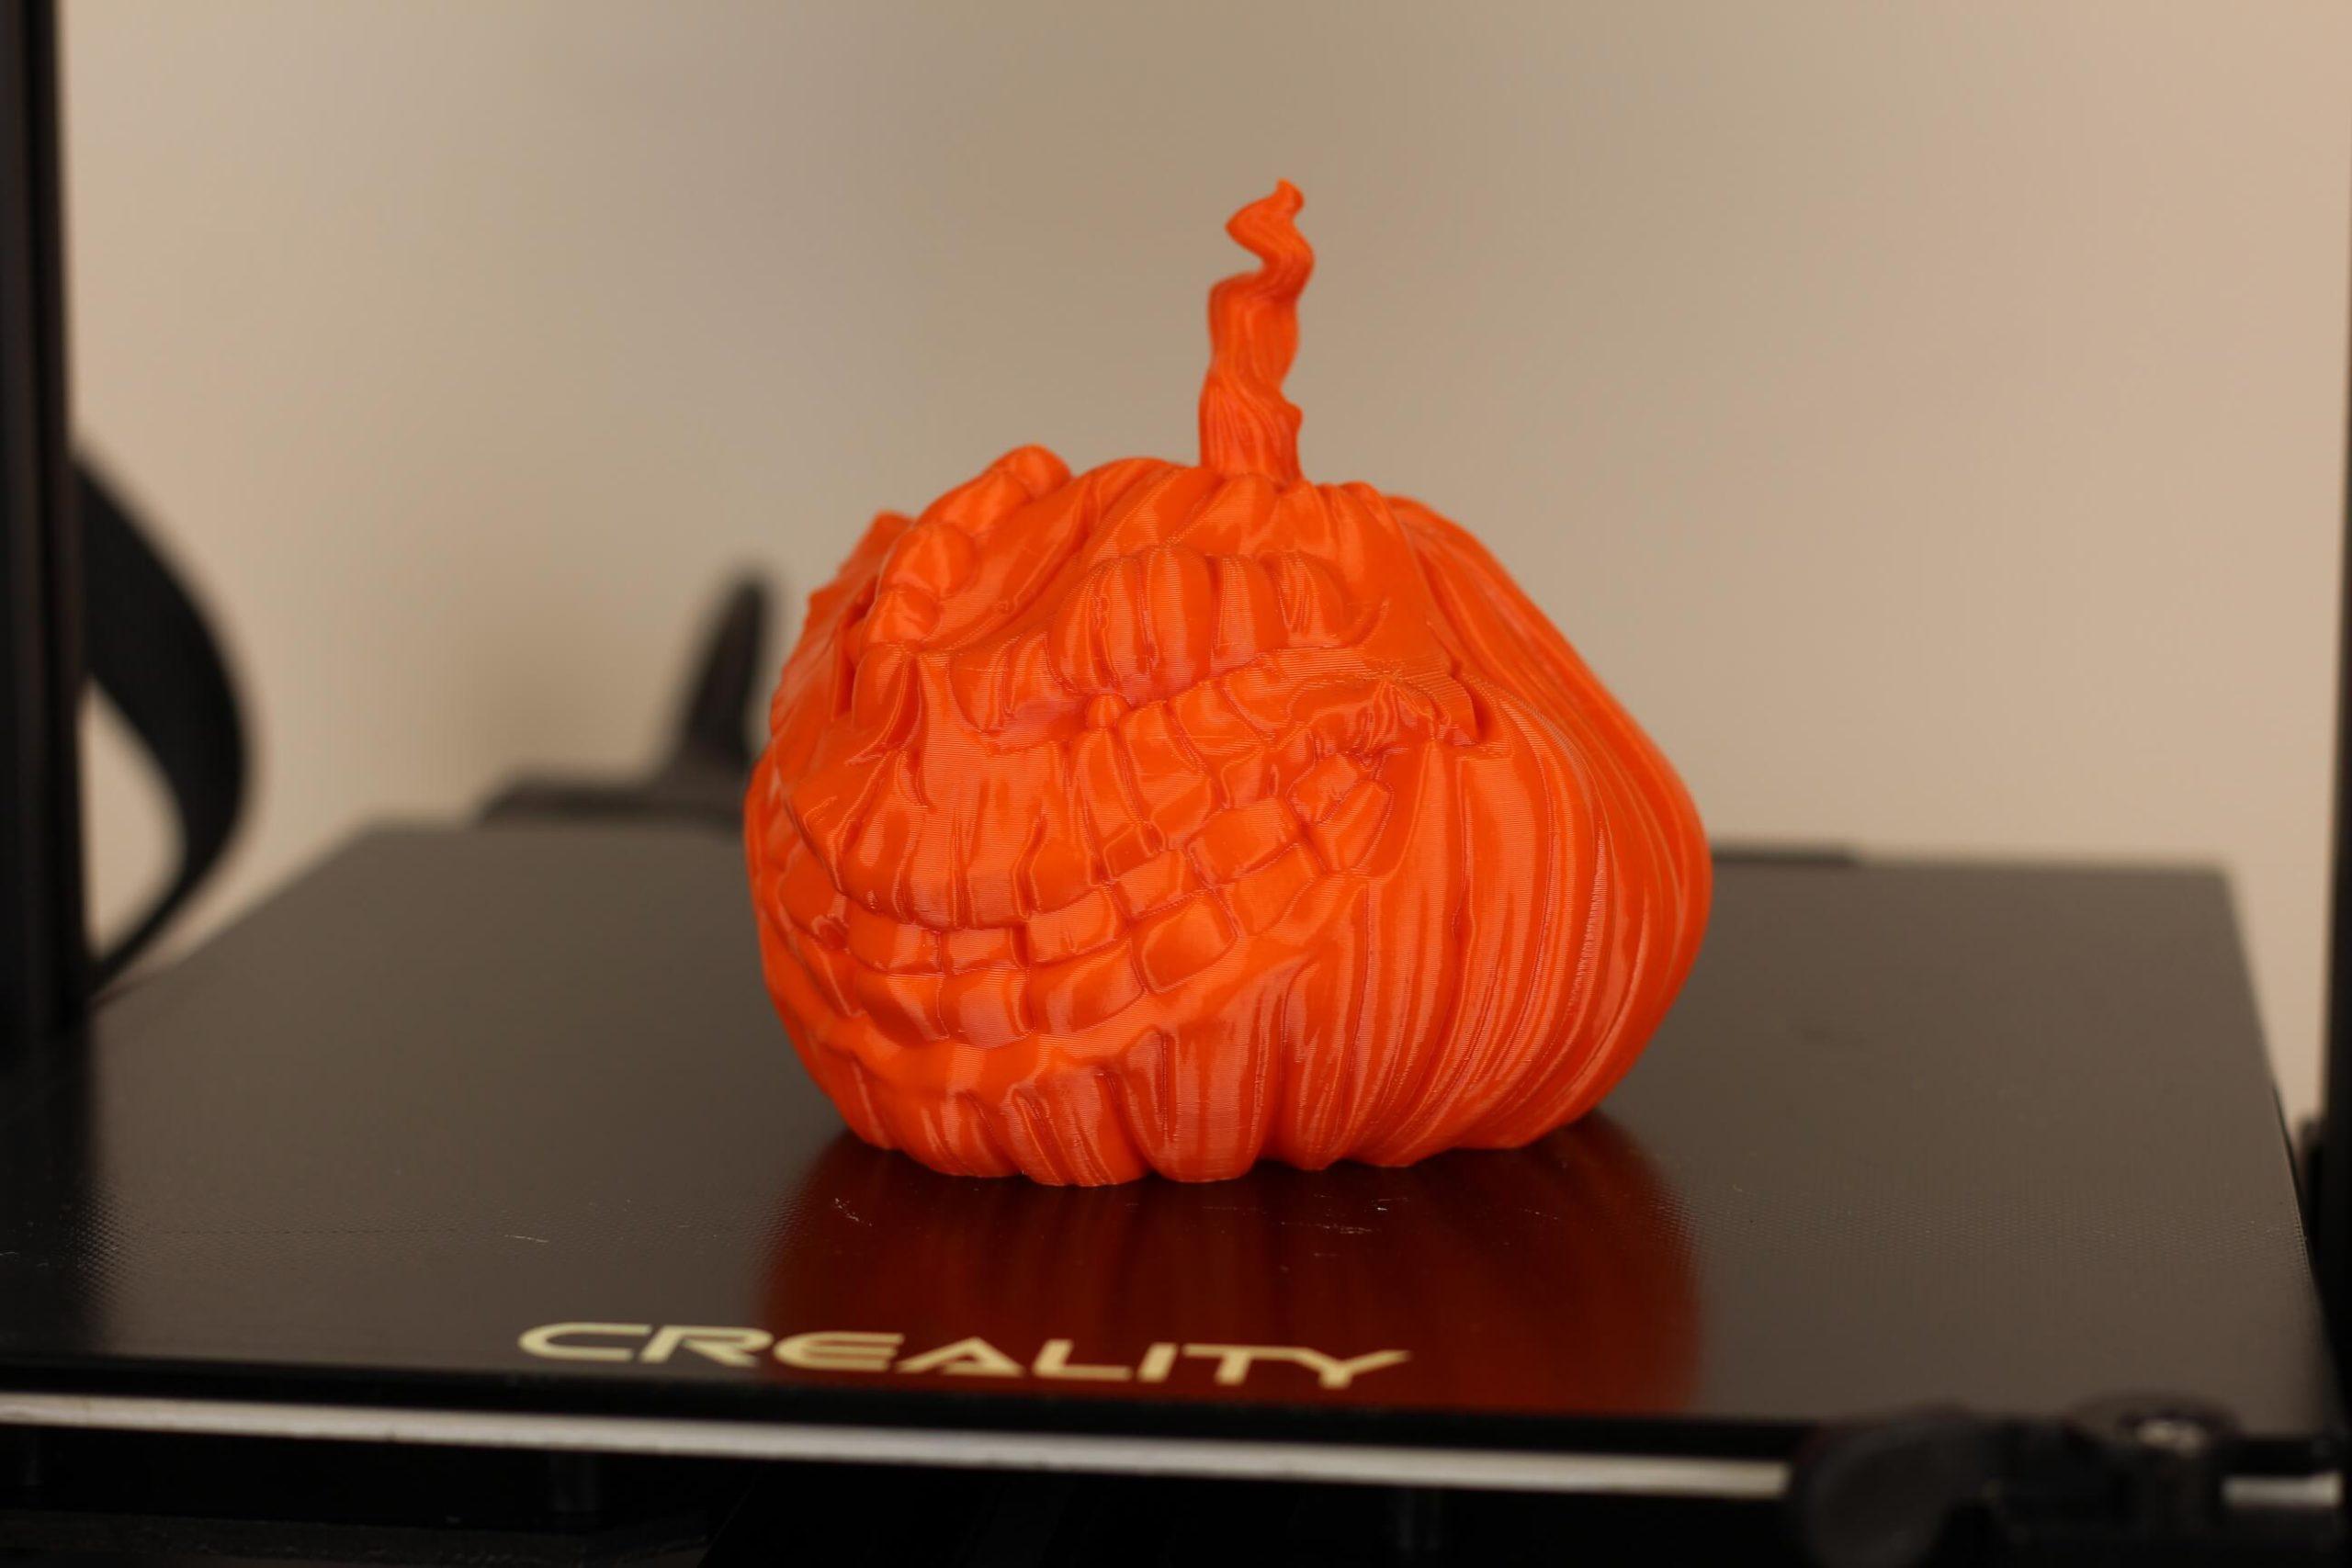 Grinning-Pumpkin-PETG-print-on-CR-6-SE-1